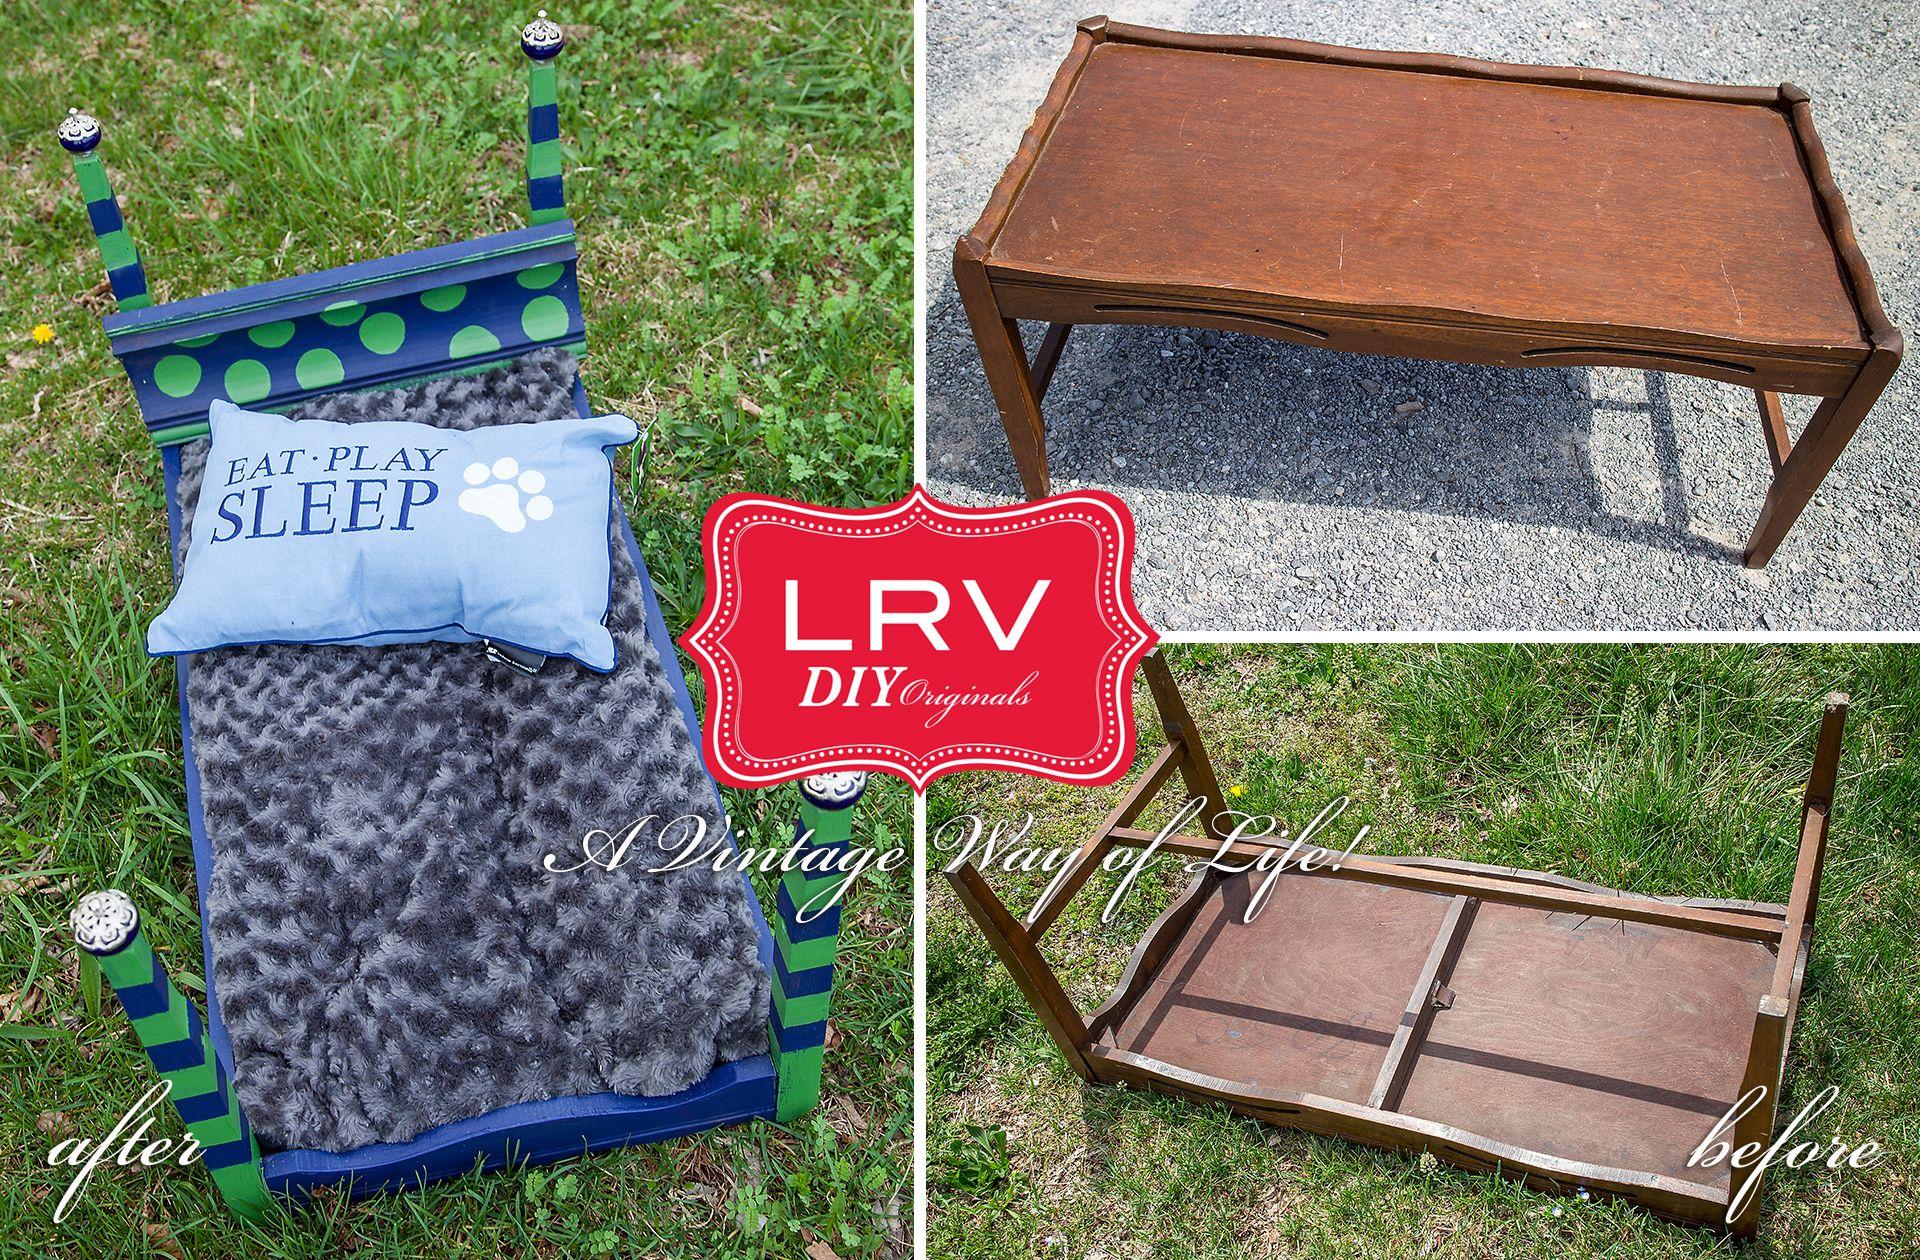 Vintage Wecycled Dog Beds! Dog bed, Outdoor blanket